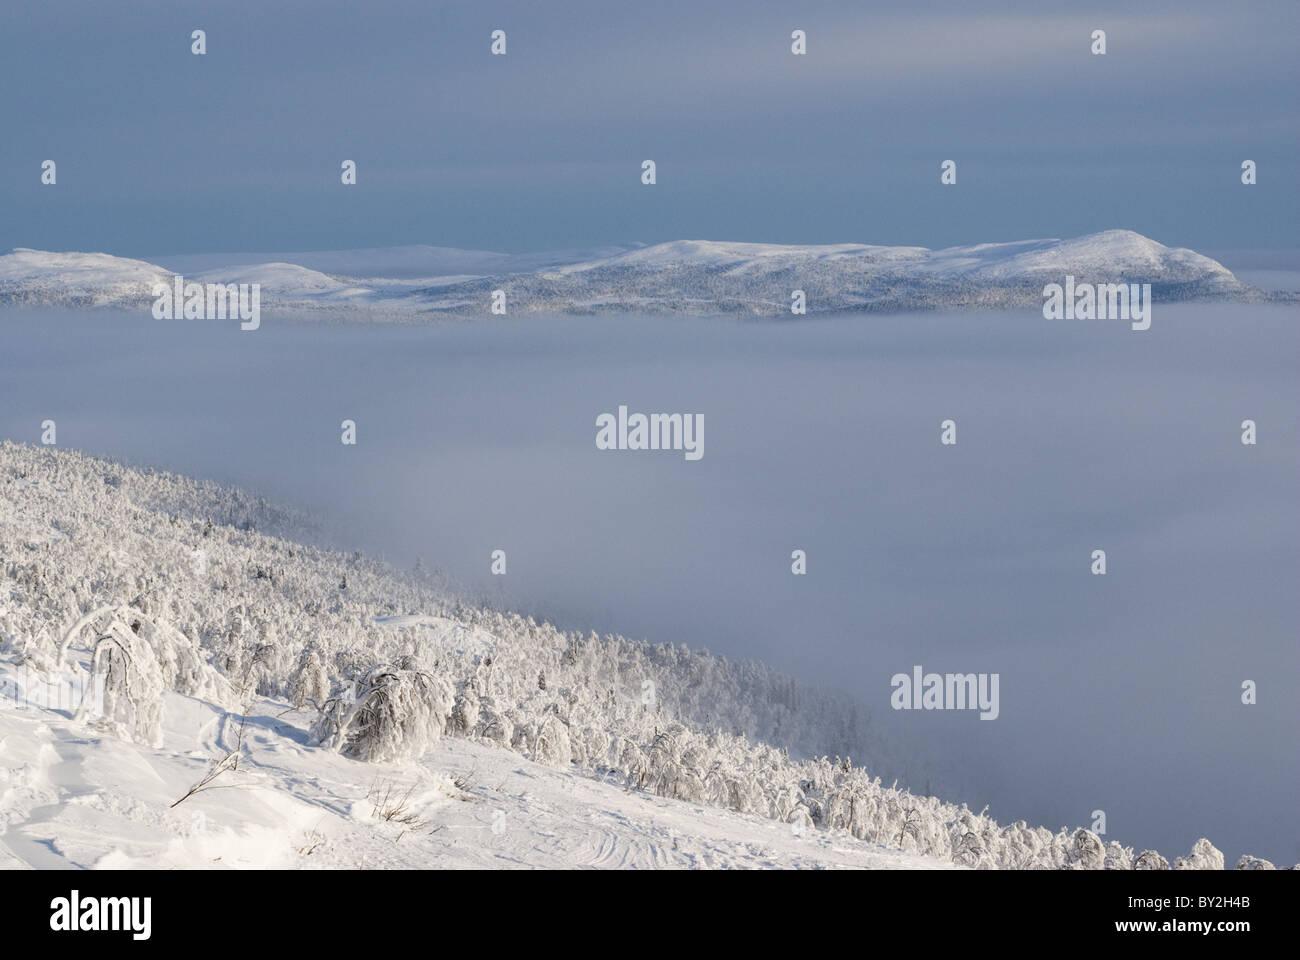 Cloud filled valey in Kittelfjäll, Swedish Lapland. - Stock Image